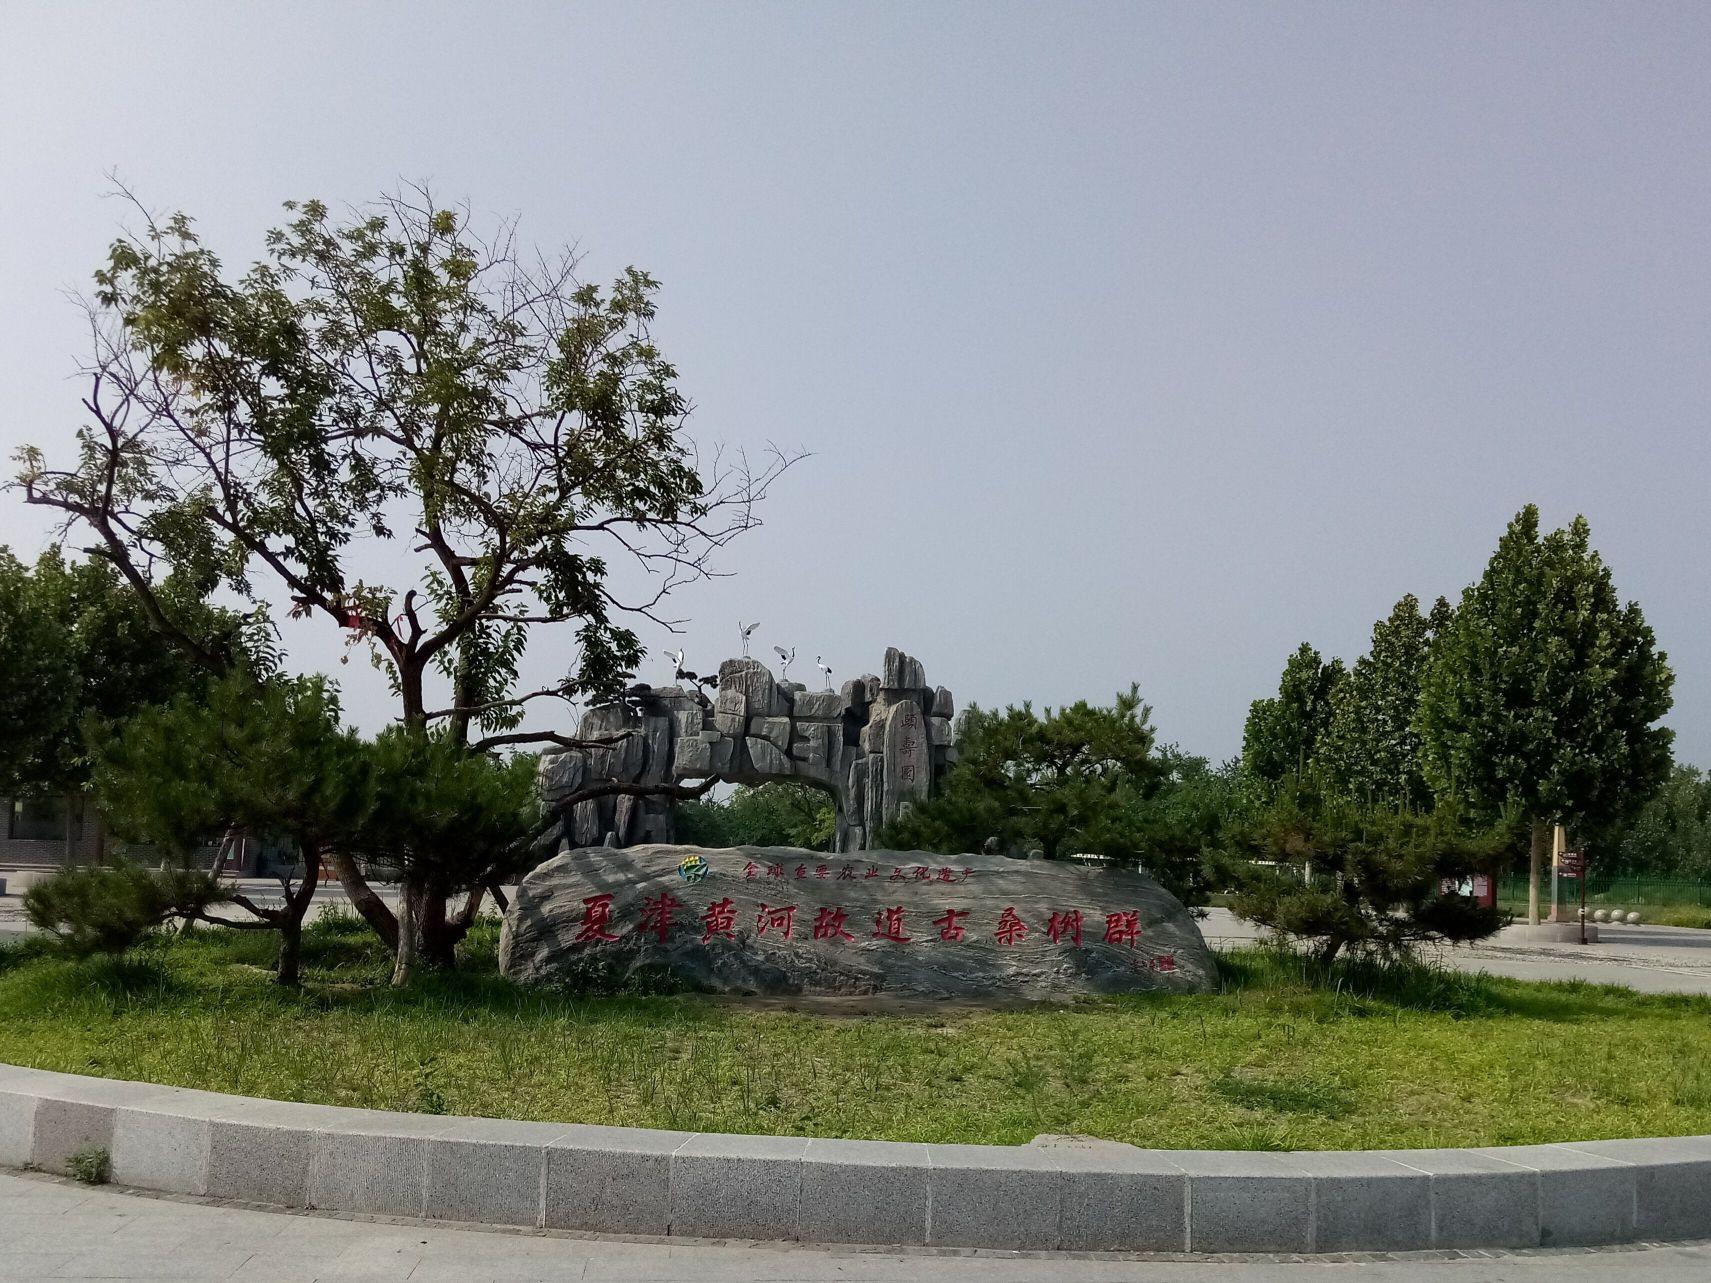 Xiajin Yellow River Forest Park